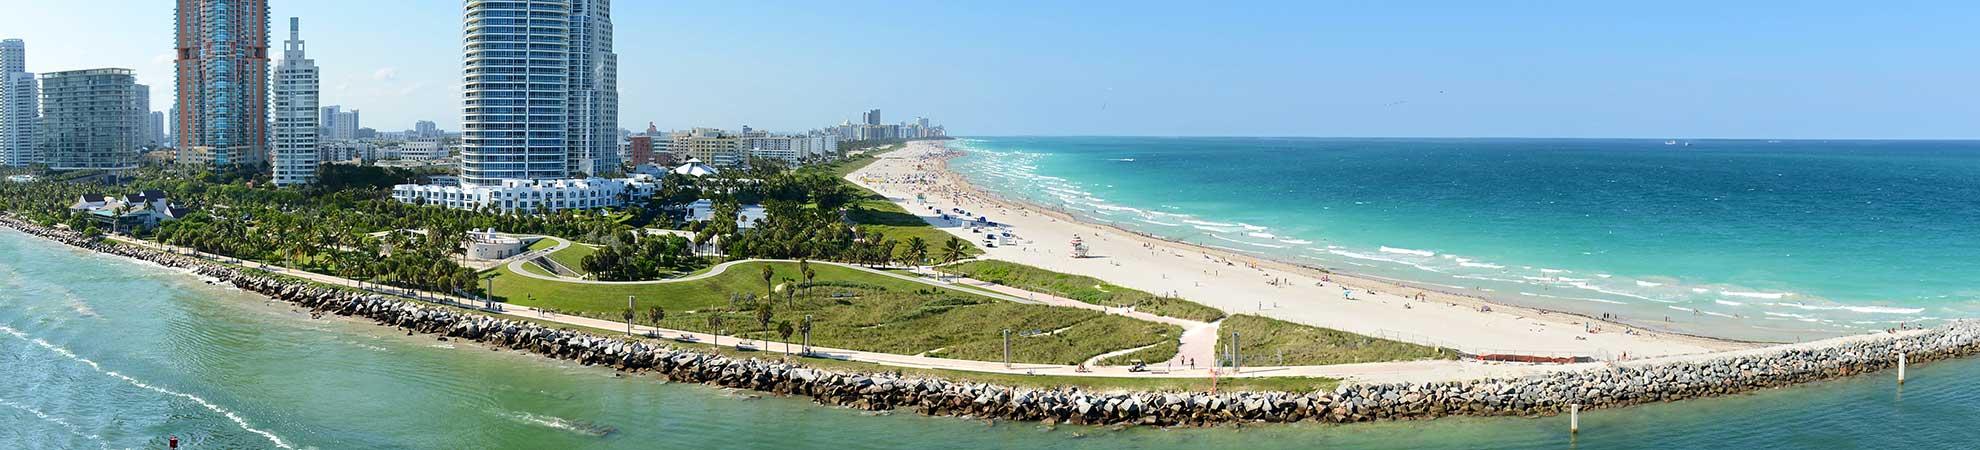 Miami Beach Plage